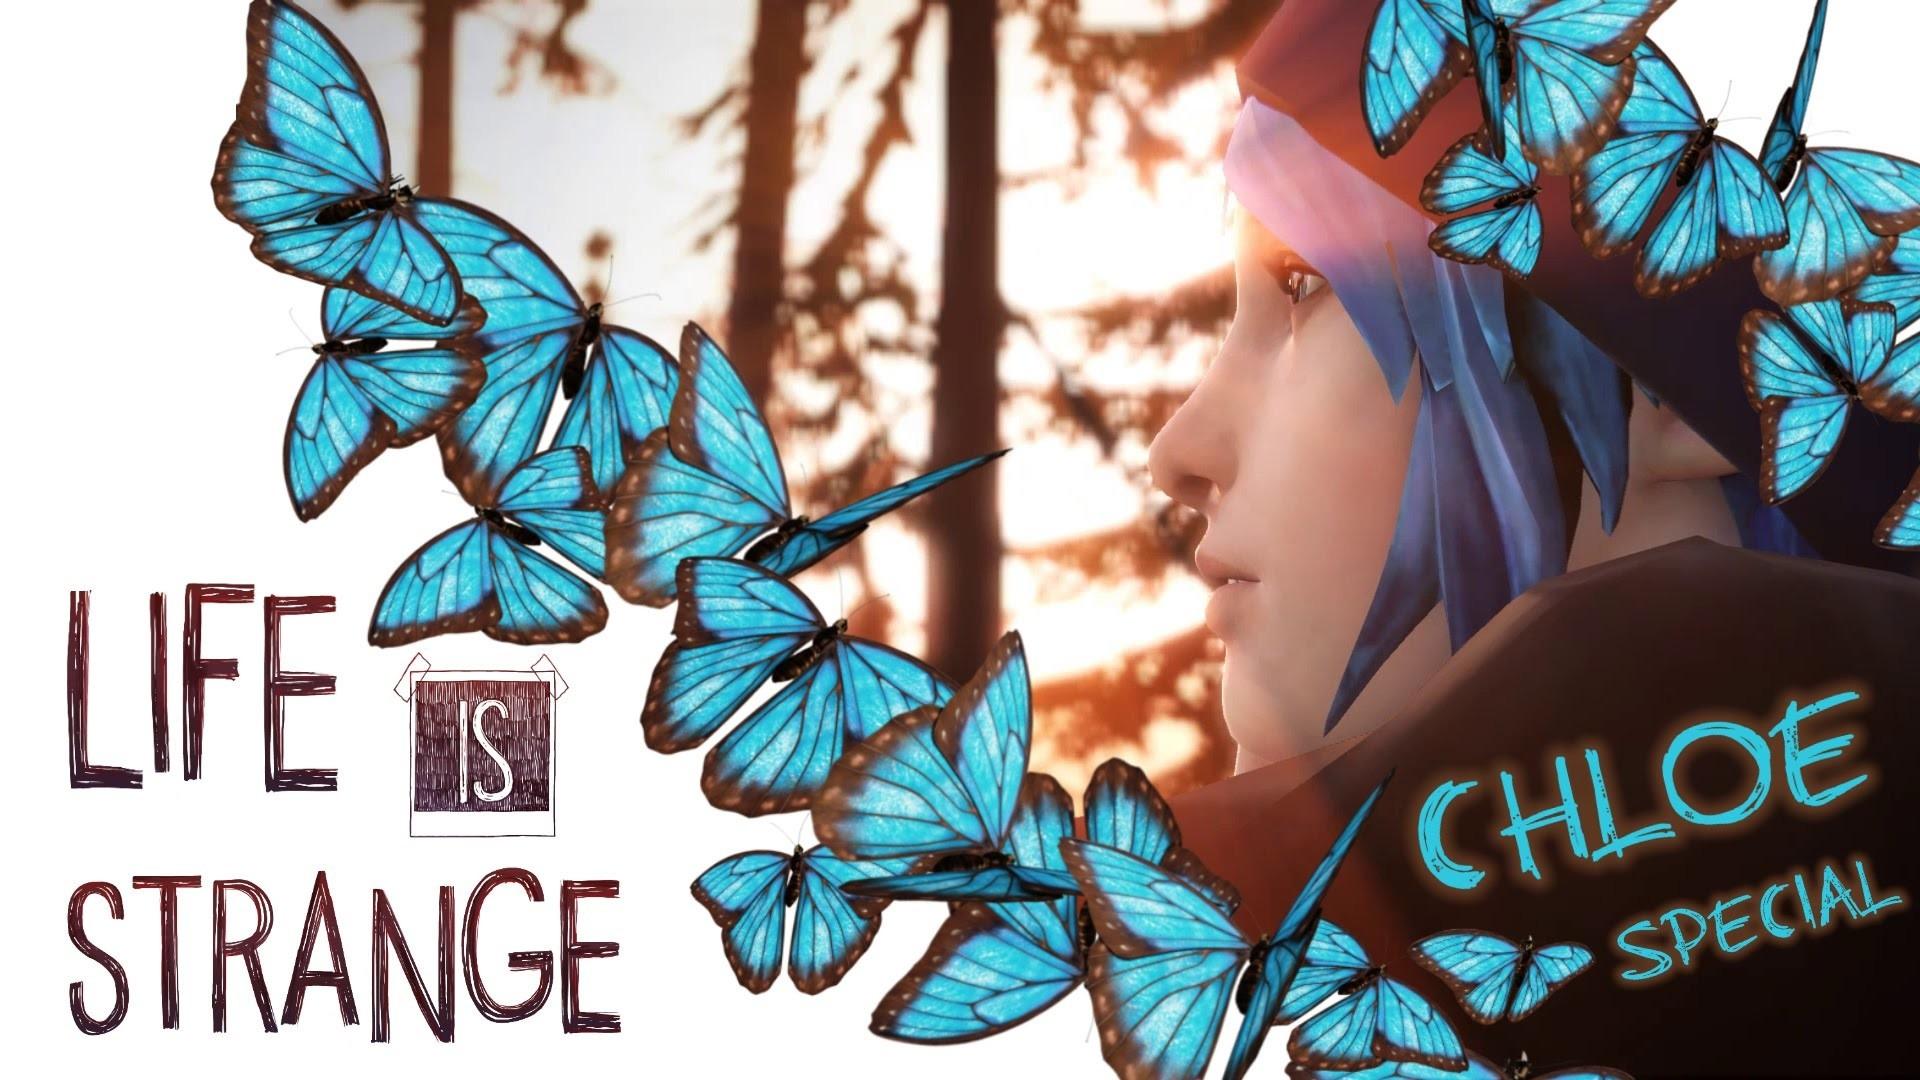 Res: 1920x1080, Life Is Strange - Remembering Chloe Price | [Ennlyn] [HD] [1080p] [60fps] -  YouTube